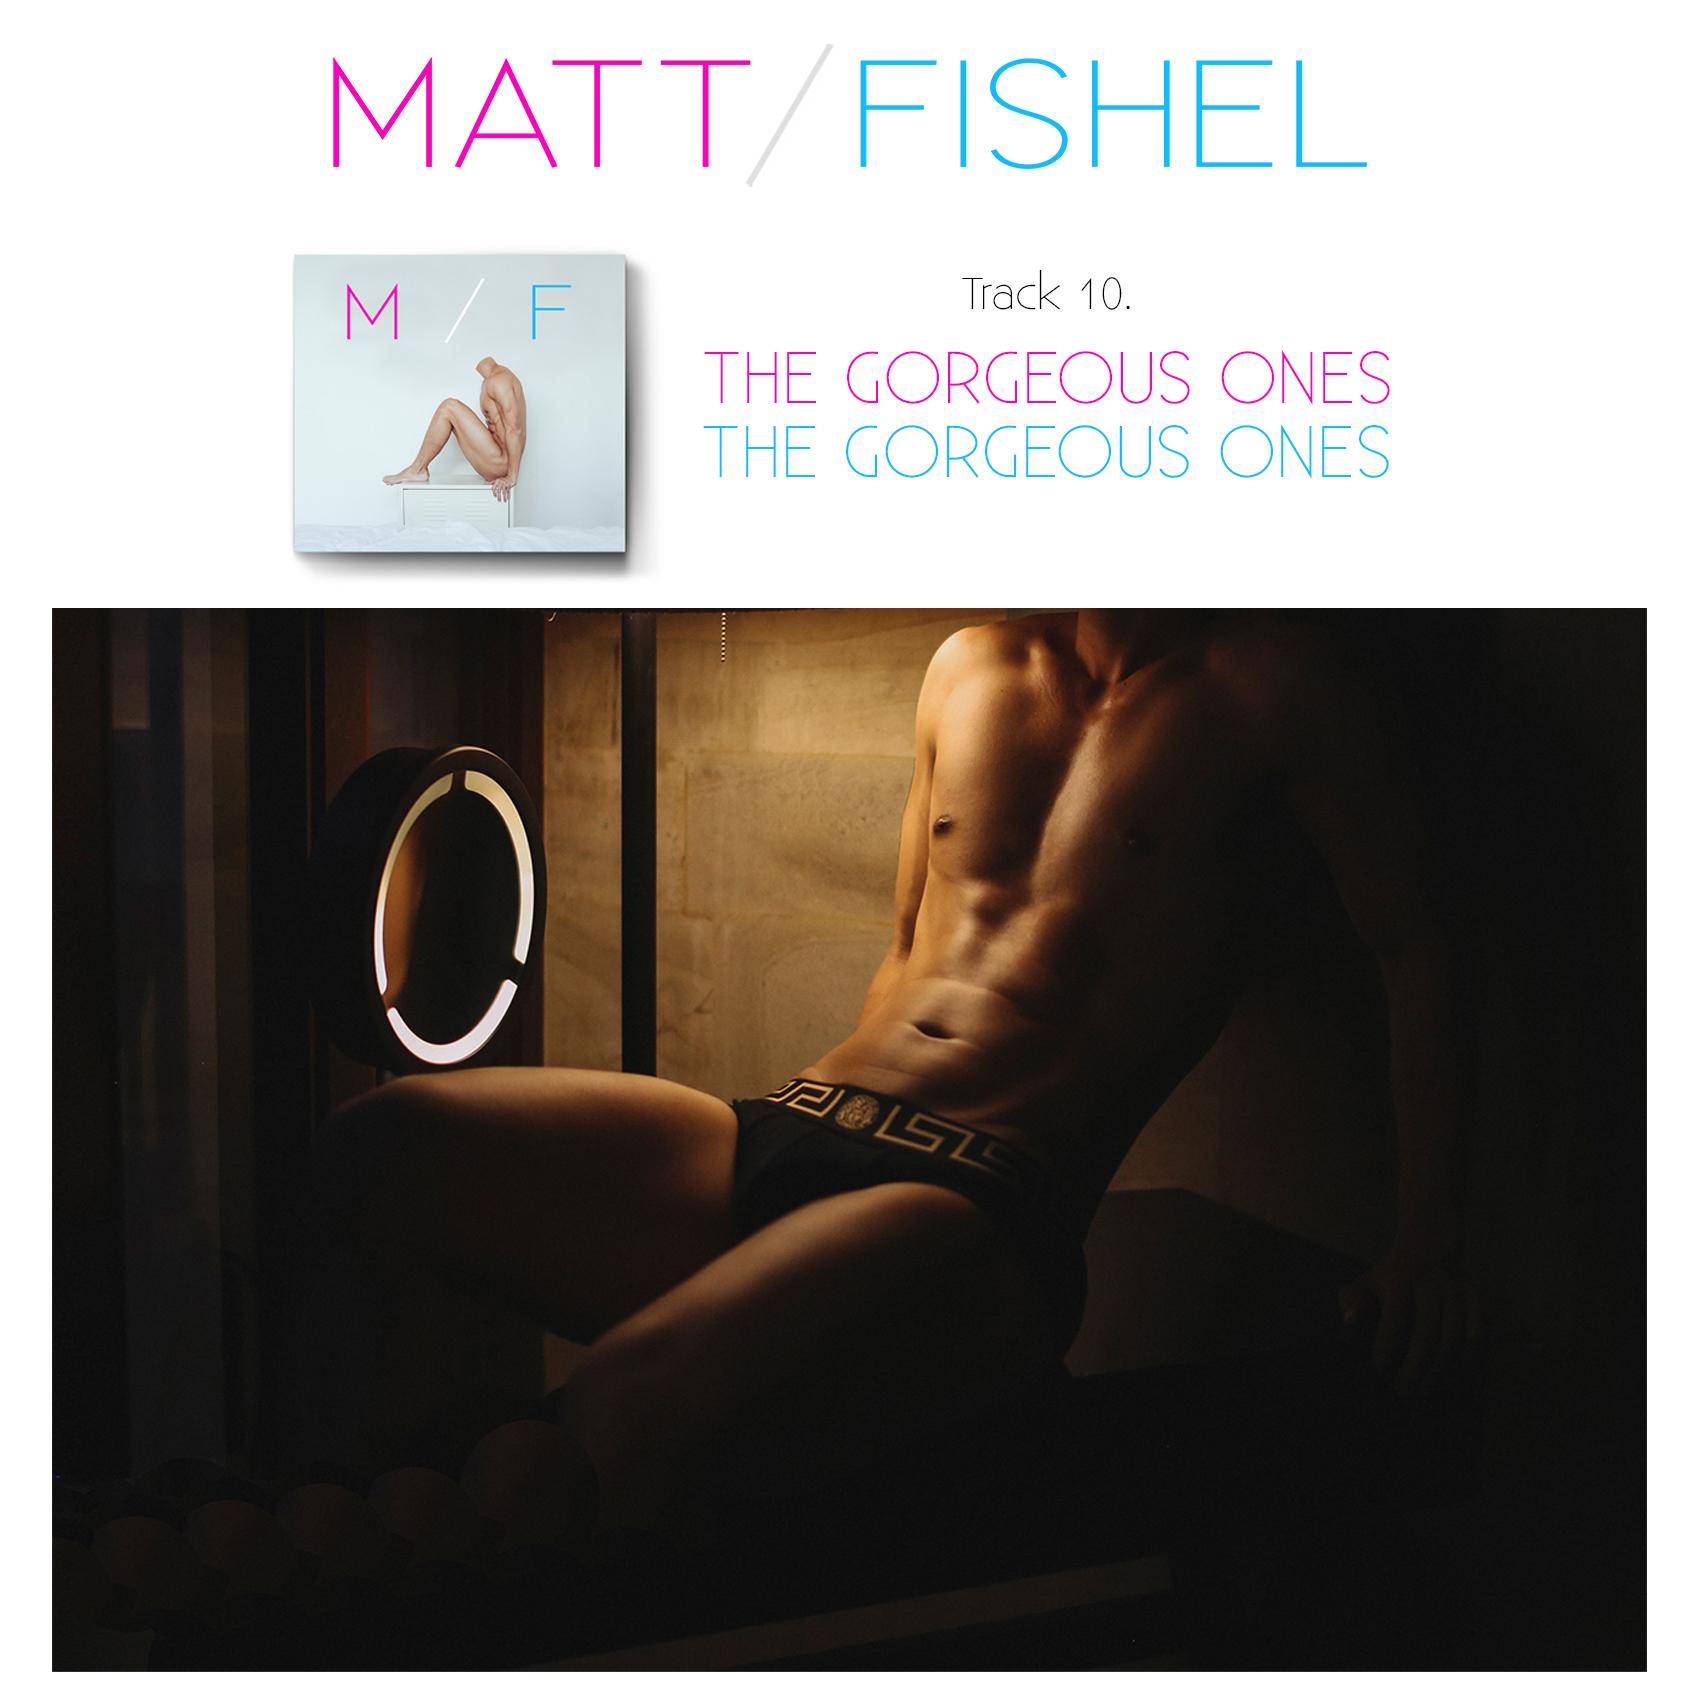 Matt Fishel_MF_Track 10_The Gorgeous Ones 1.jpg